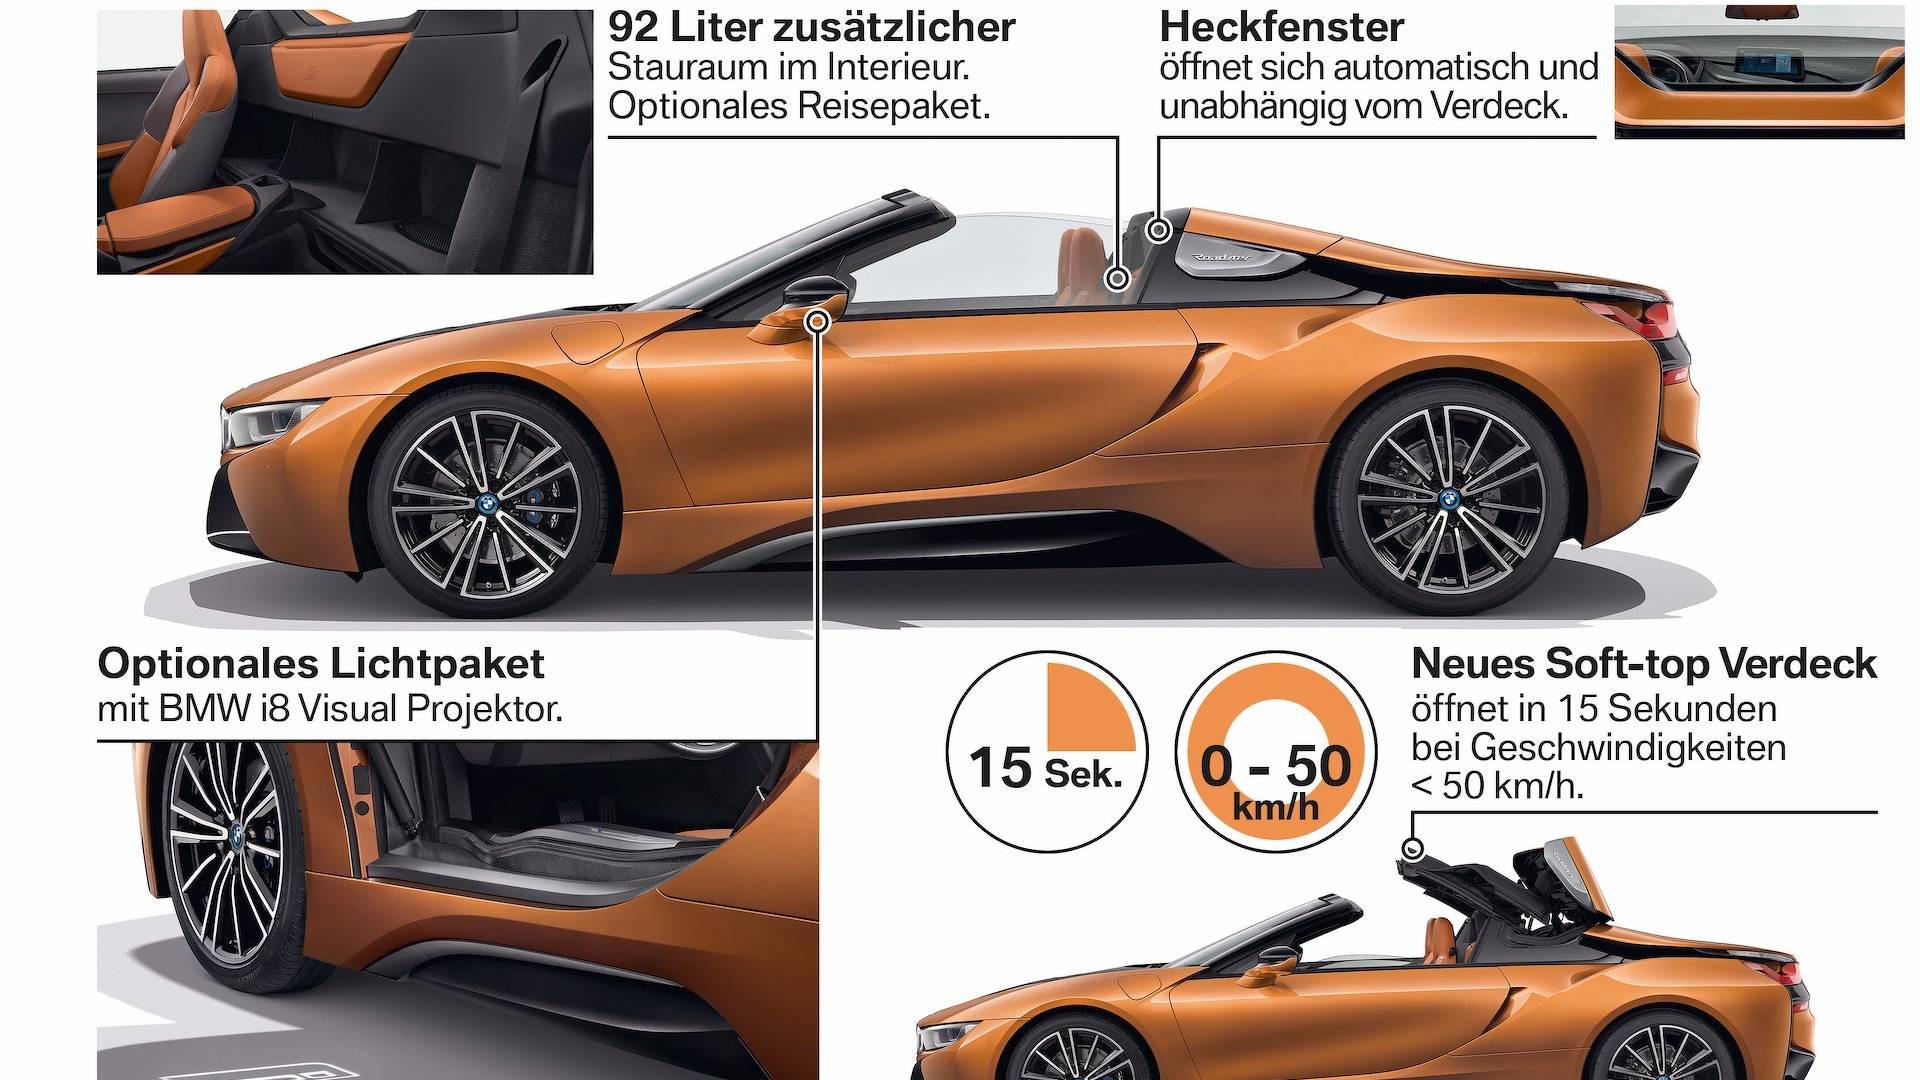 2019_BMW_i8_Roadster_26